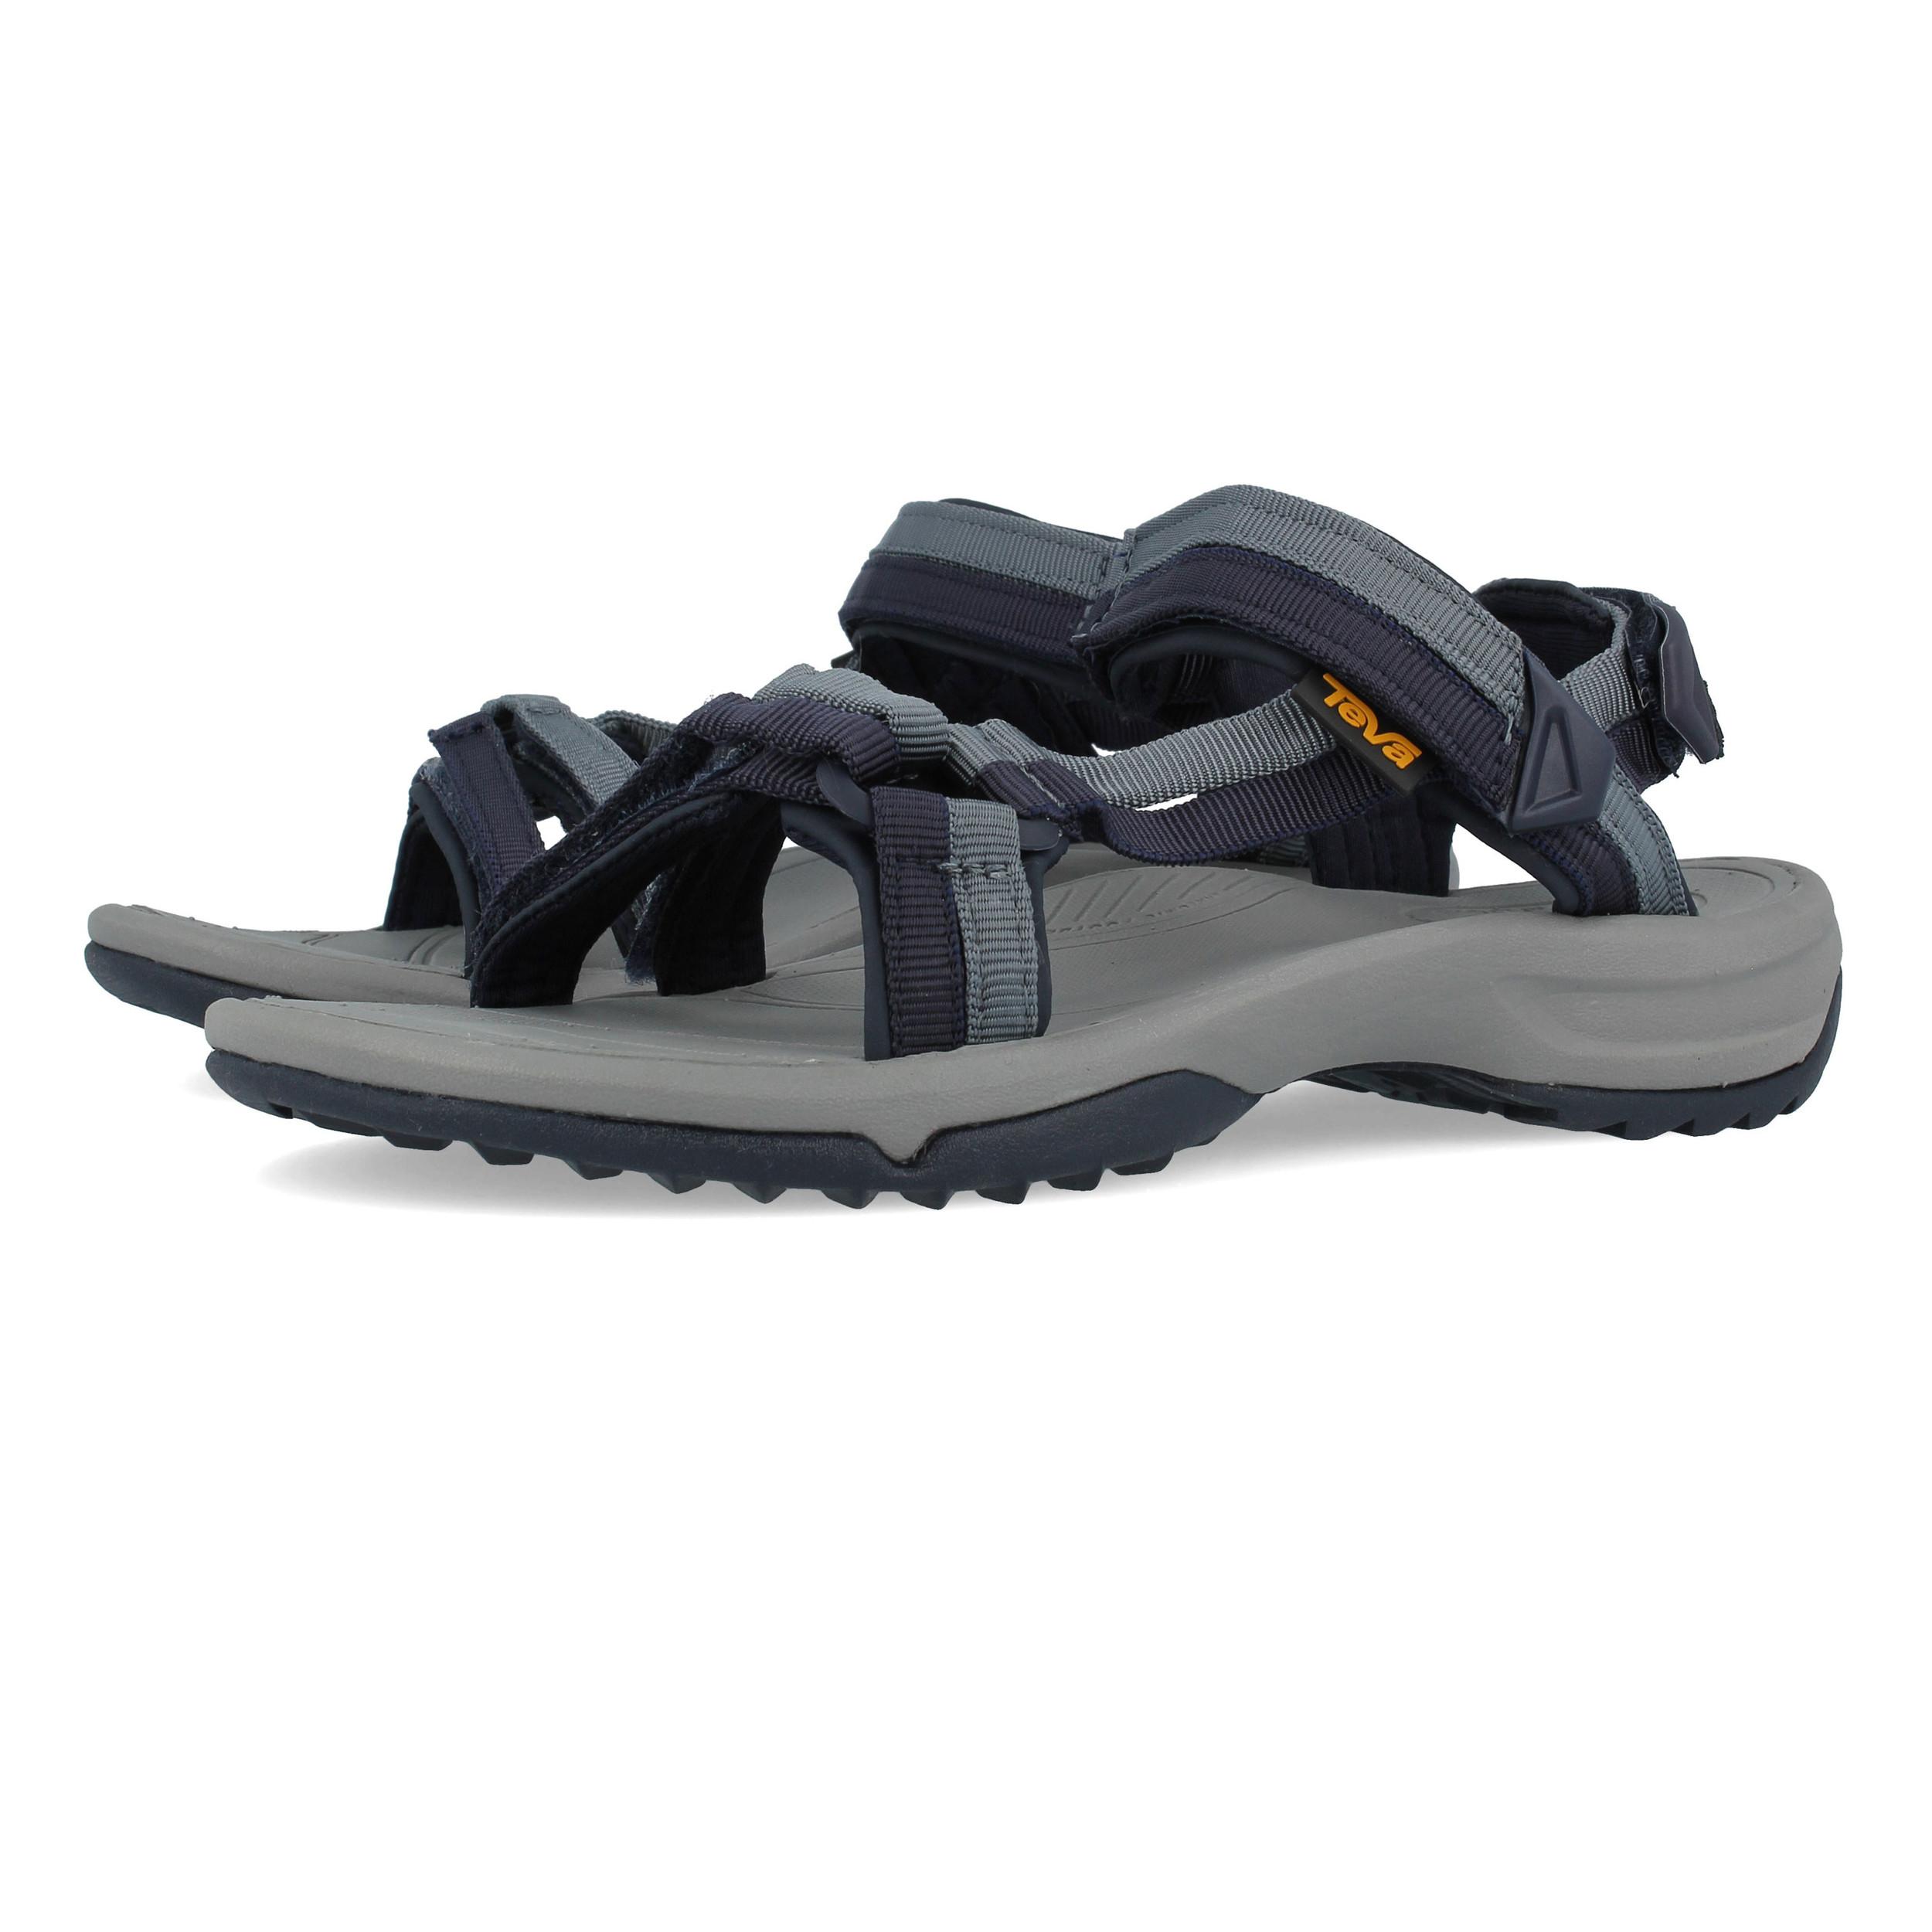 b050b3367770 Details about Teva Womens Terra FI Lite Walking Shoes Sandals Navy Blue  Sports Outdoors